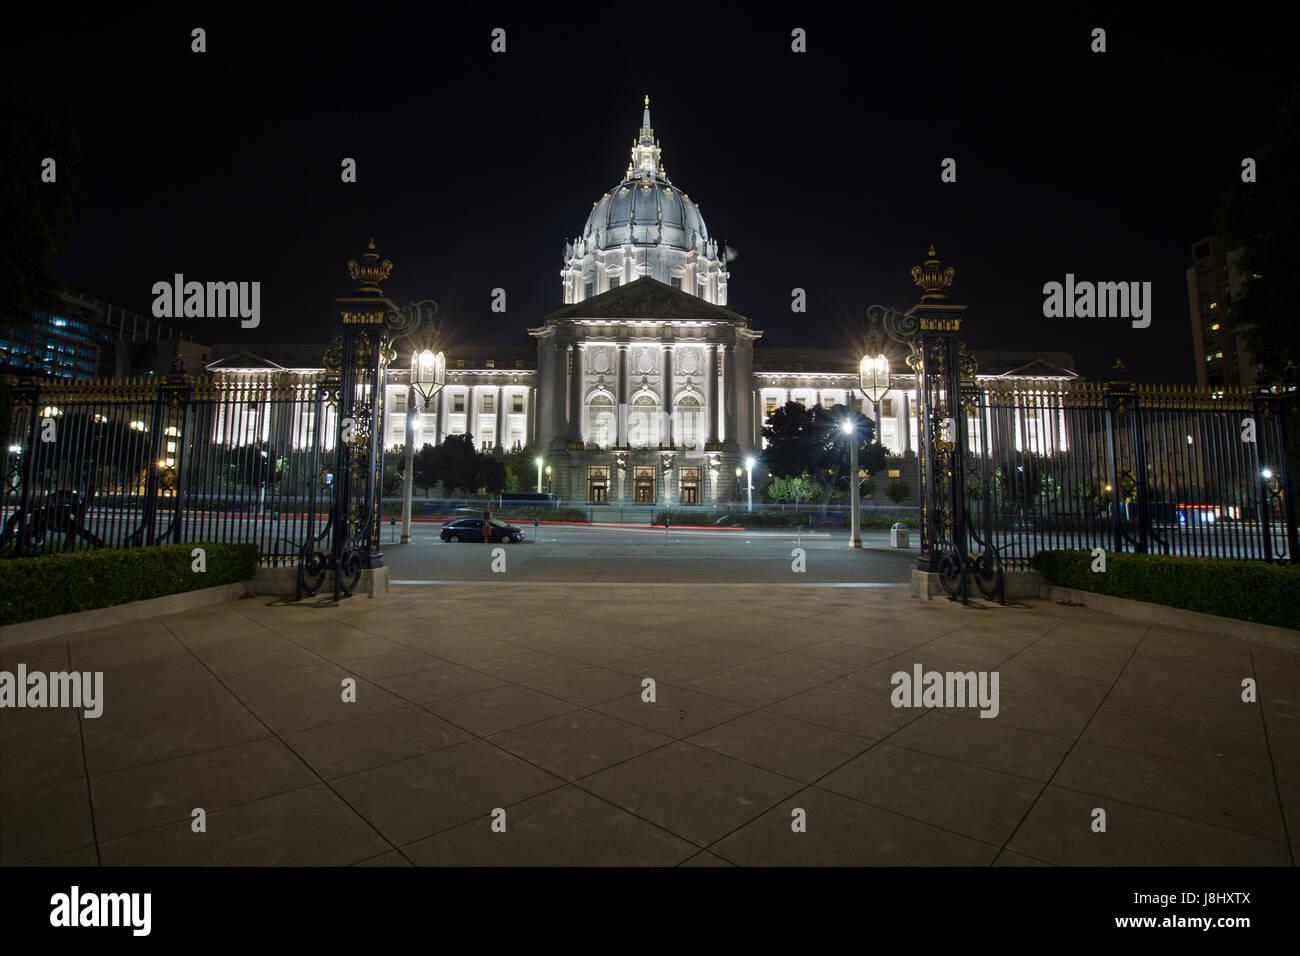 hall, city, town, night, nighttime, california, hall, city, town, dome, night, - Stock Image